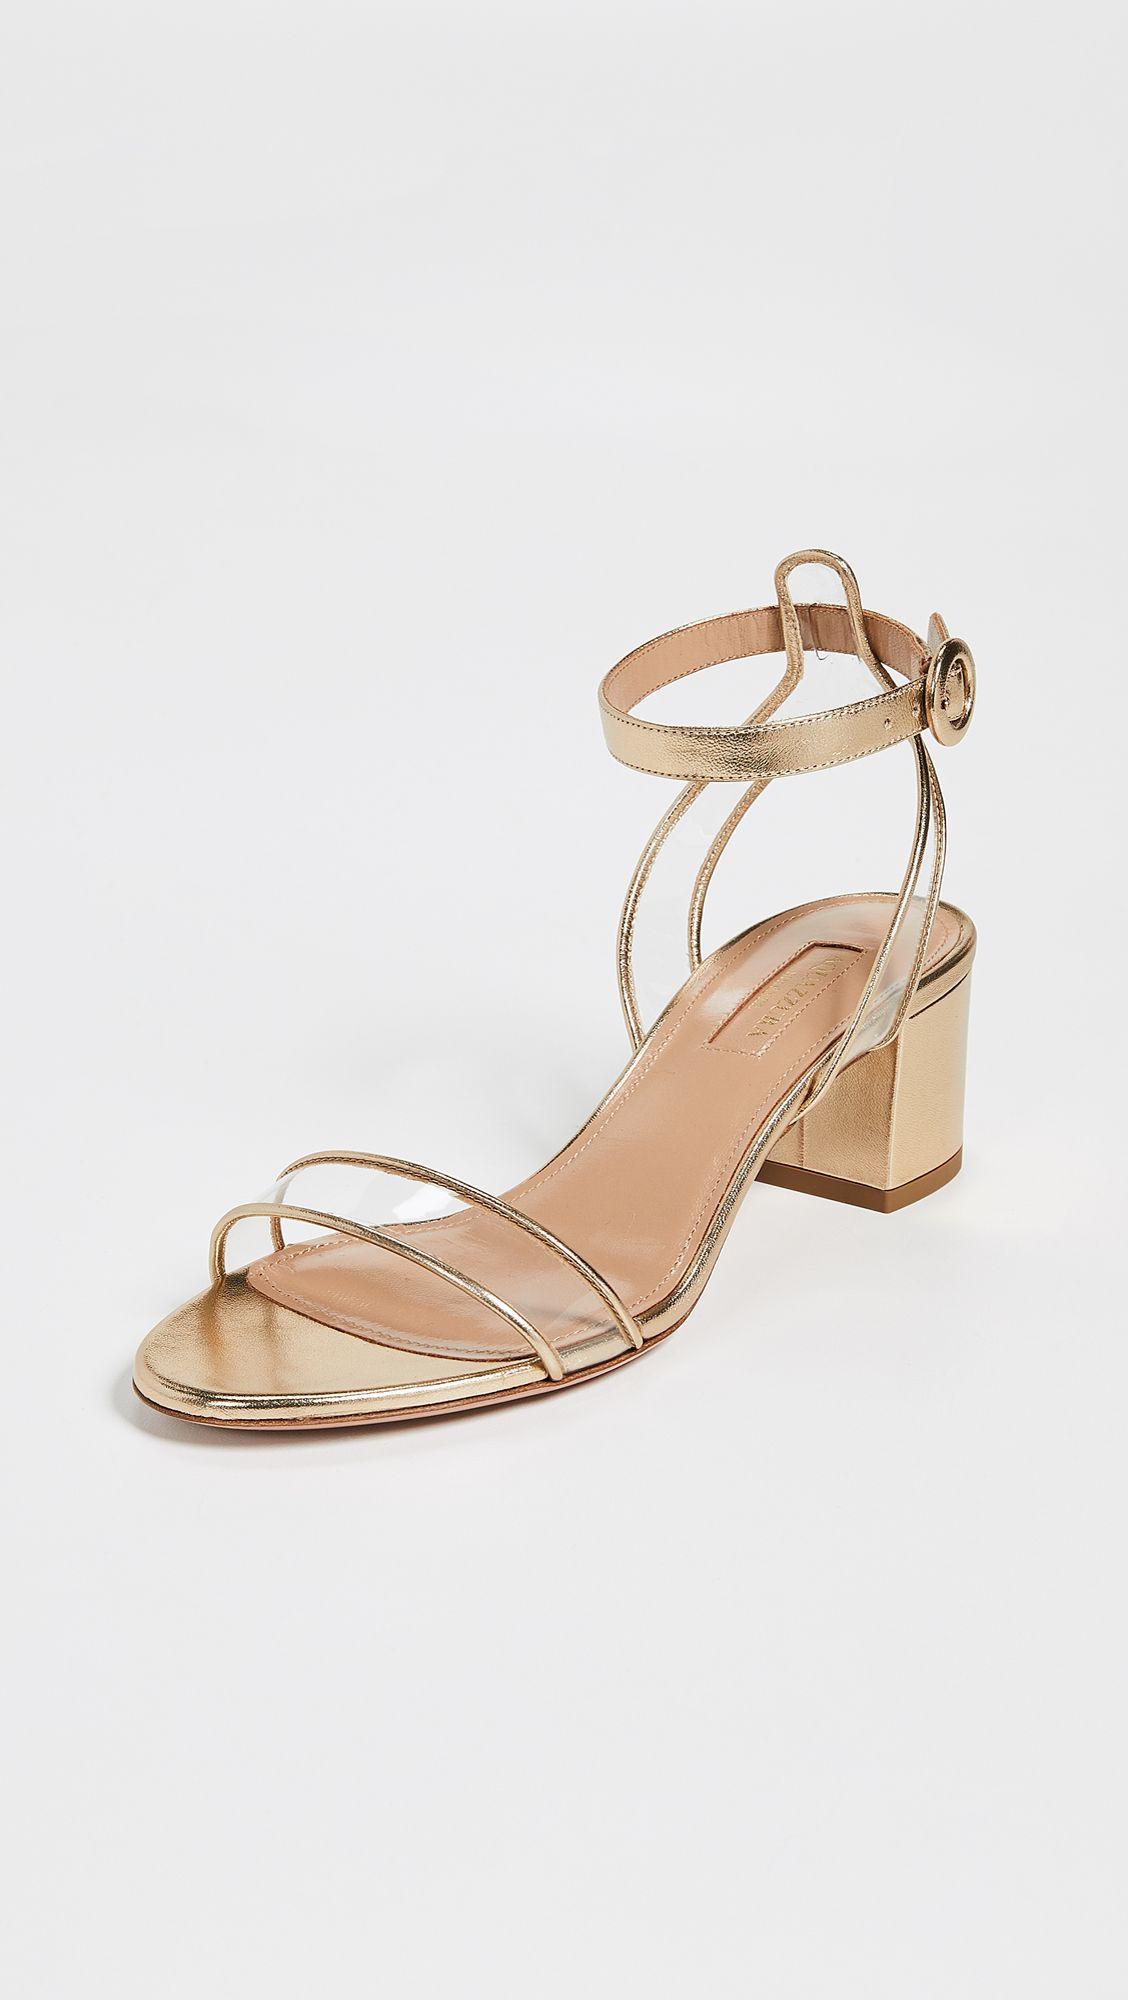 dd8d12b9ae4 Aquazzura - Minimalist 50 Sandals | Evening Shoes You'll Want To Buy ...